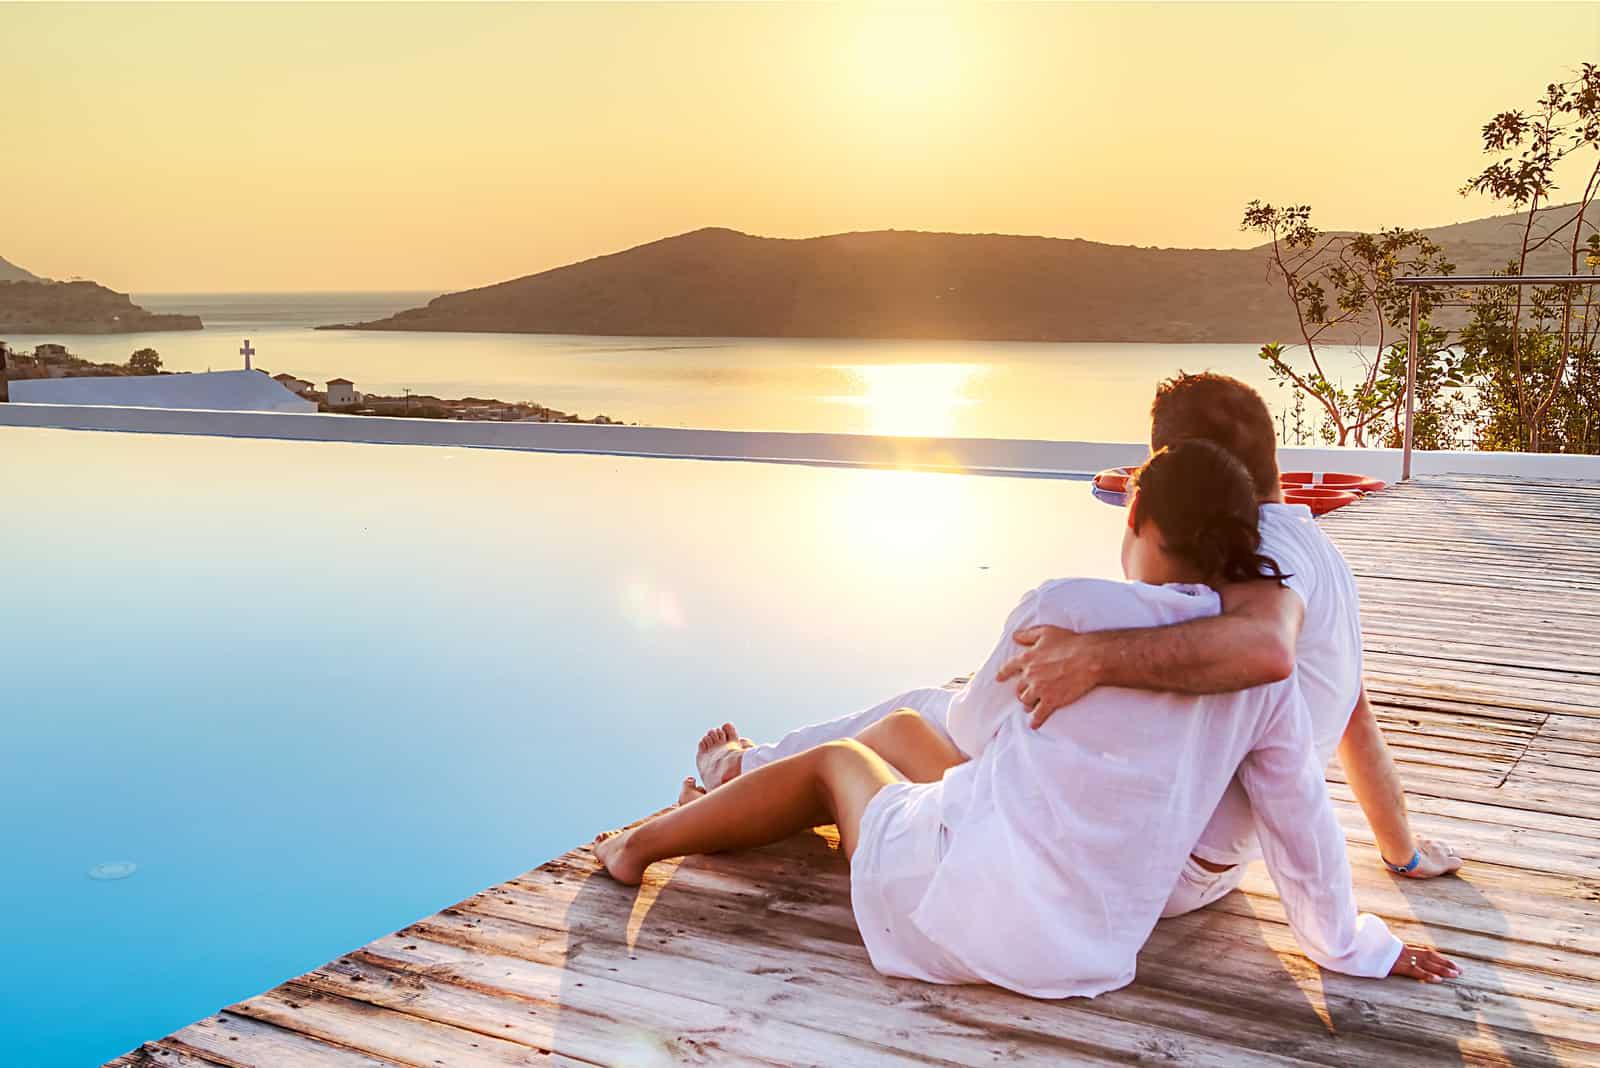 Verliebtes Paar, das gemeinsam den Sonnenaufgang beobachtet